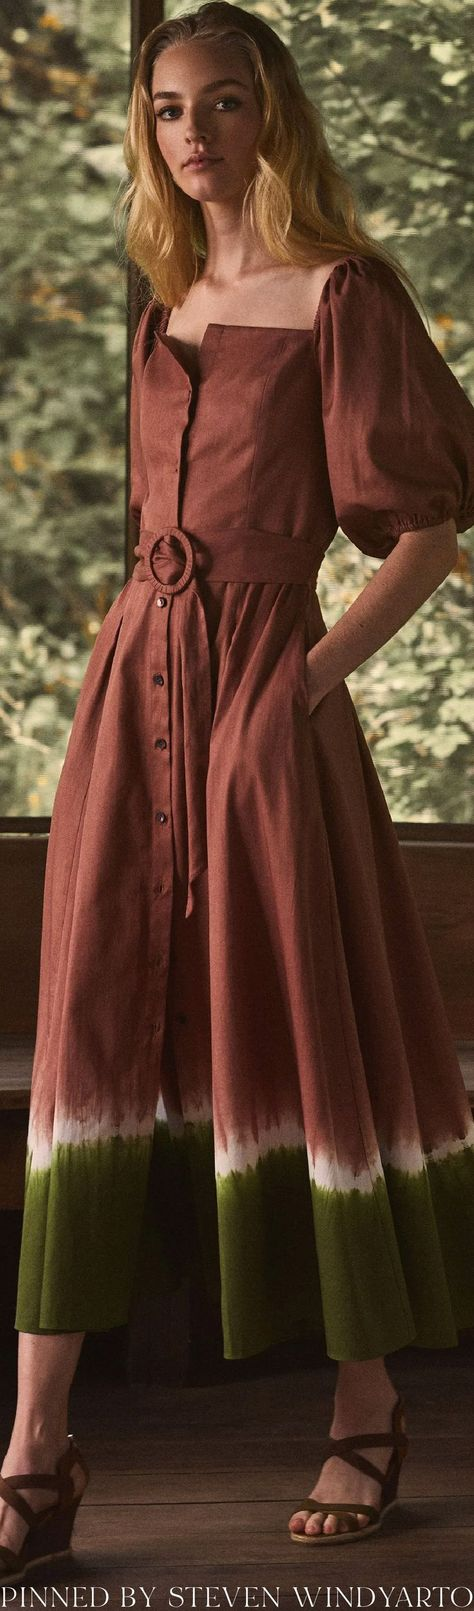 Sachin  Babi Spring 2022 Lookbook #spring2022 #ss22 #womenswear #sachinandbabi #sachinahluwalia #babiahluwalia